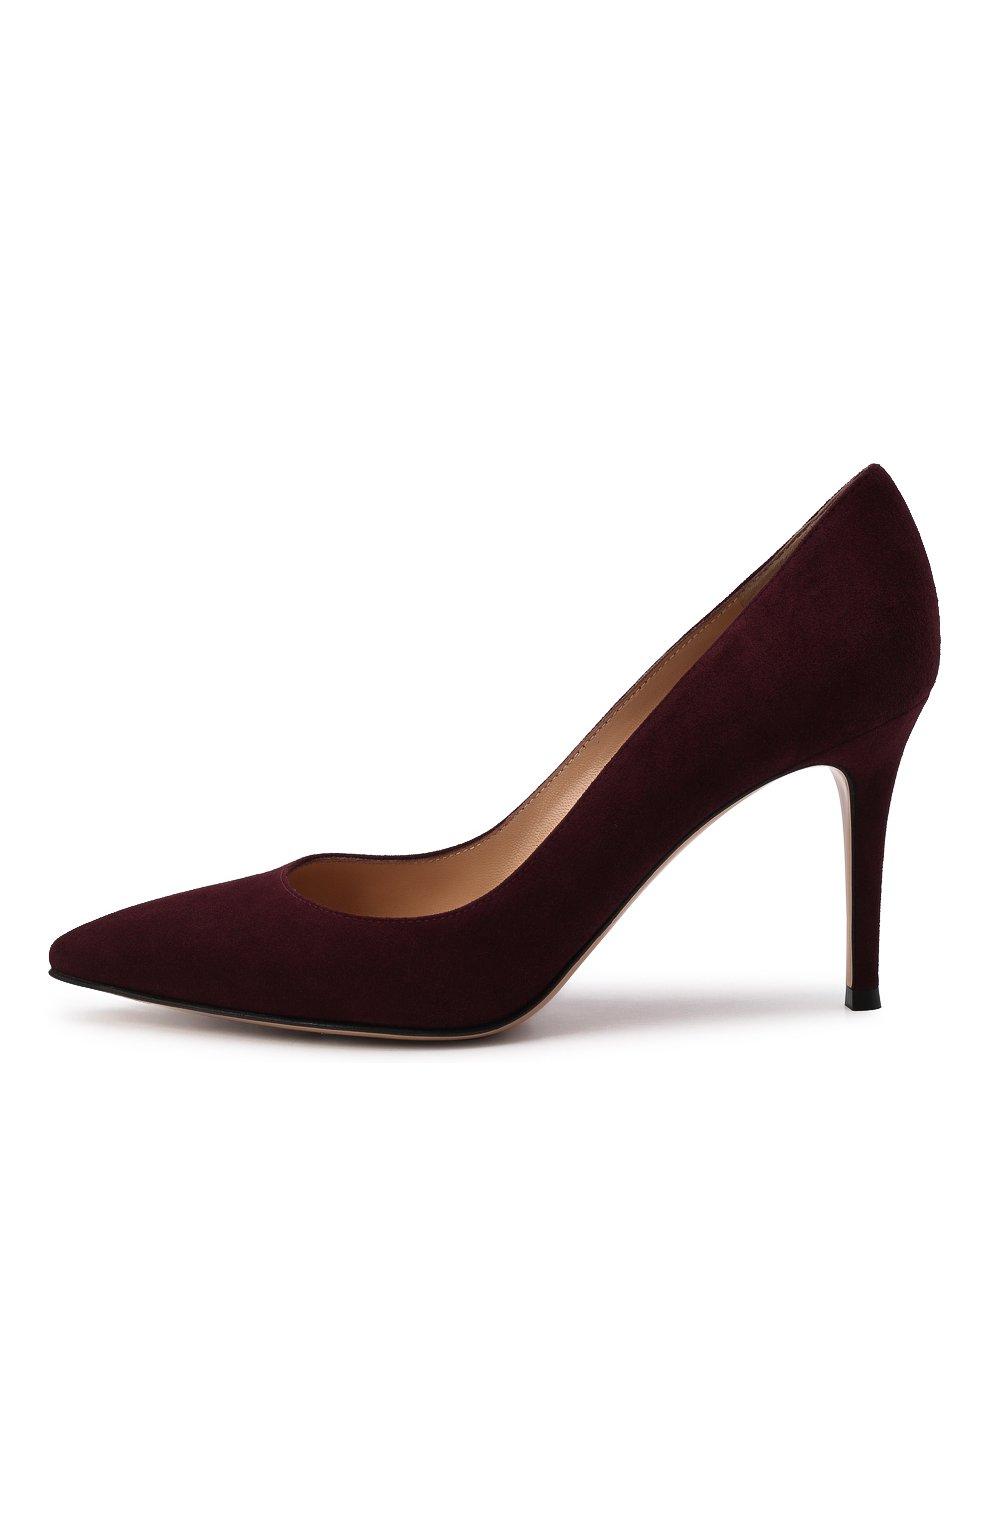 Женские замшевые туфли gianvito 85 GIANVITO ROSSI бордового цвета, арт. G24580.85RIC.CAMR0YA | Фото 4